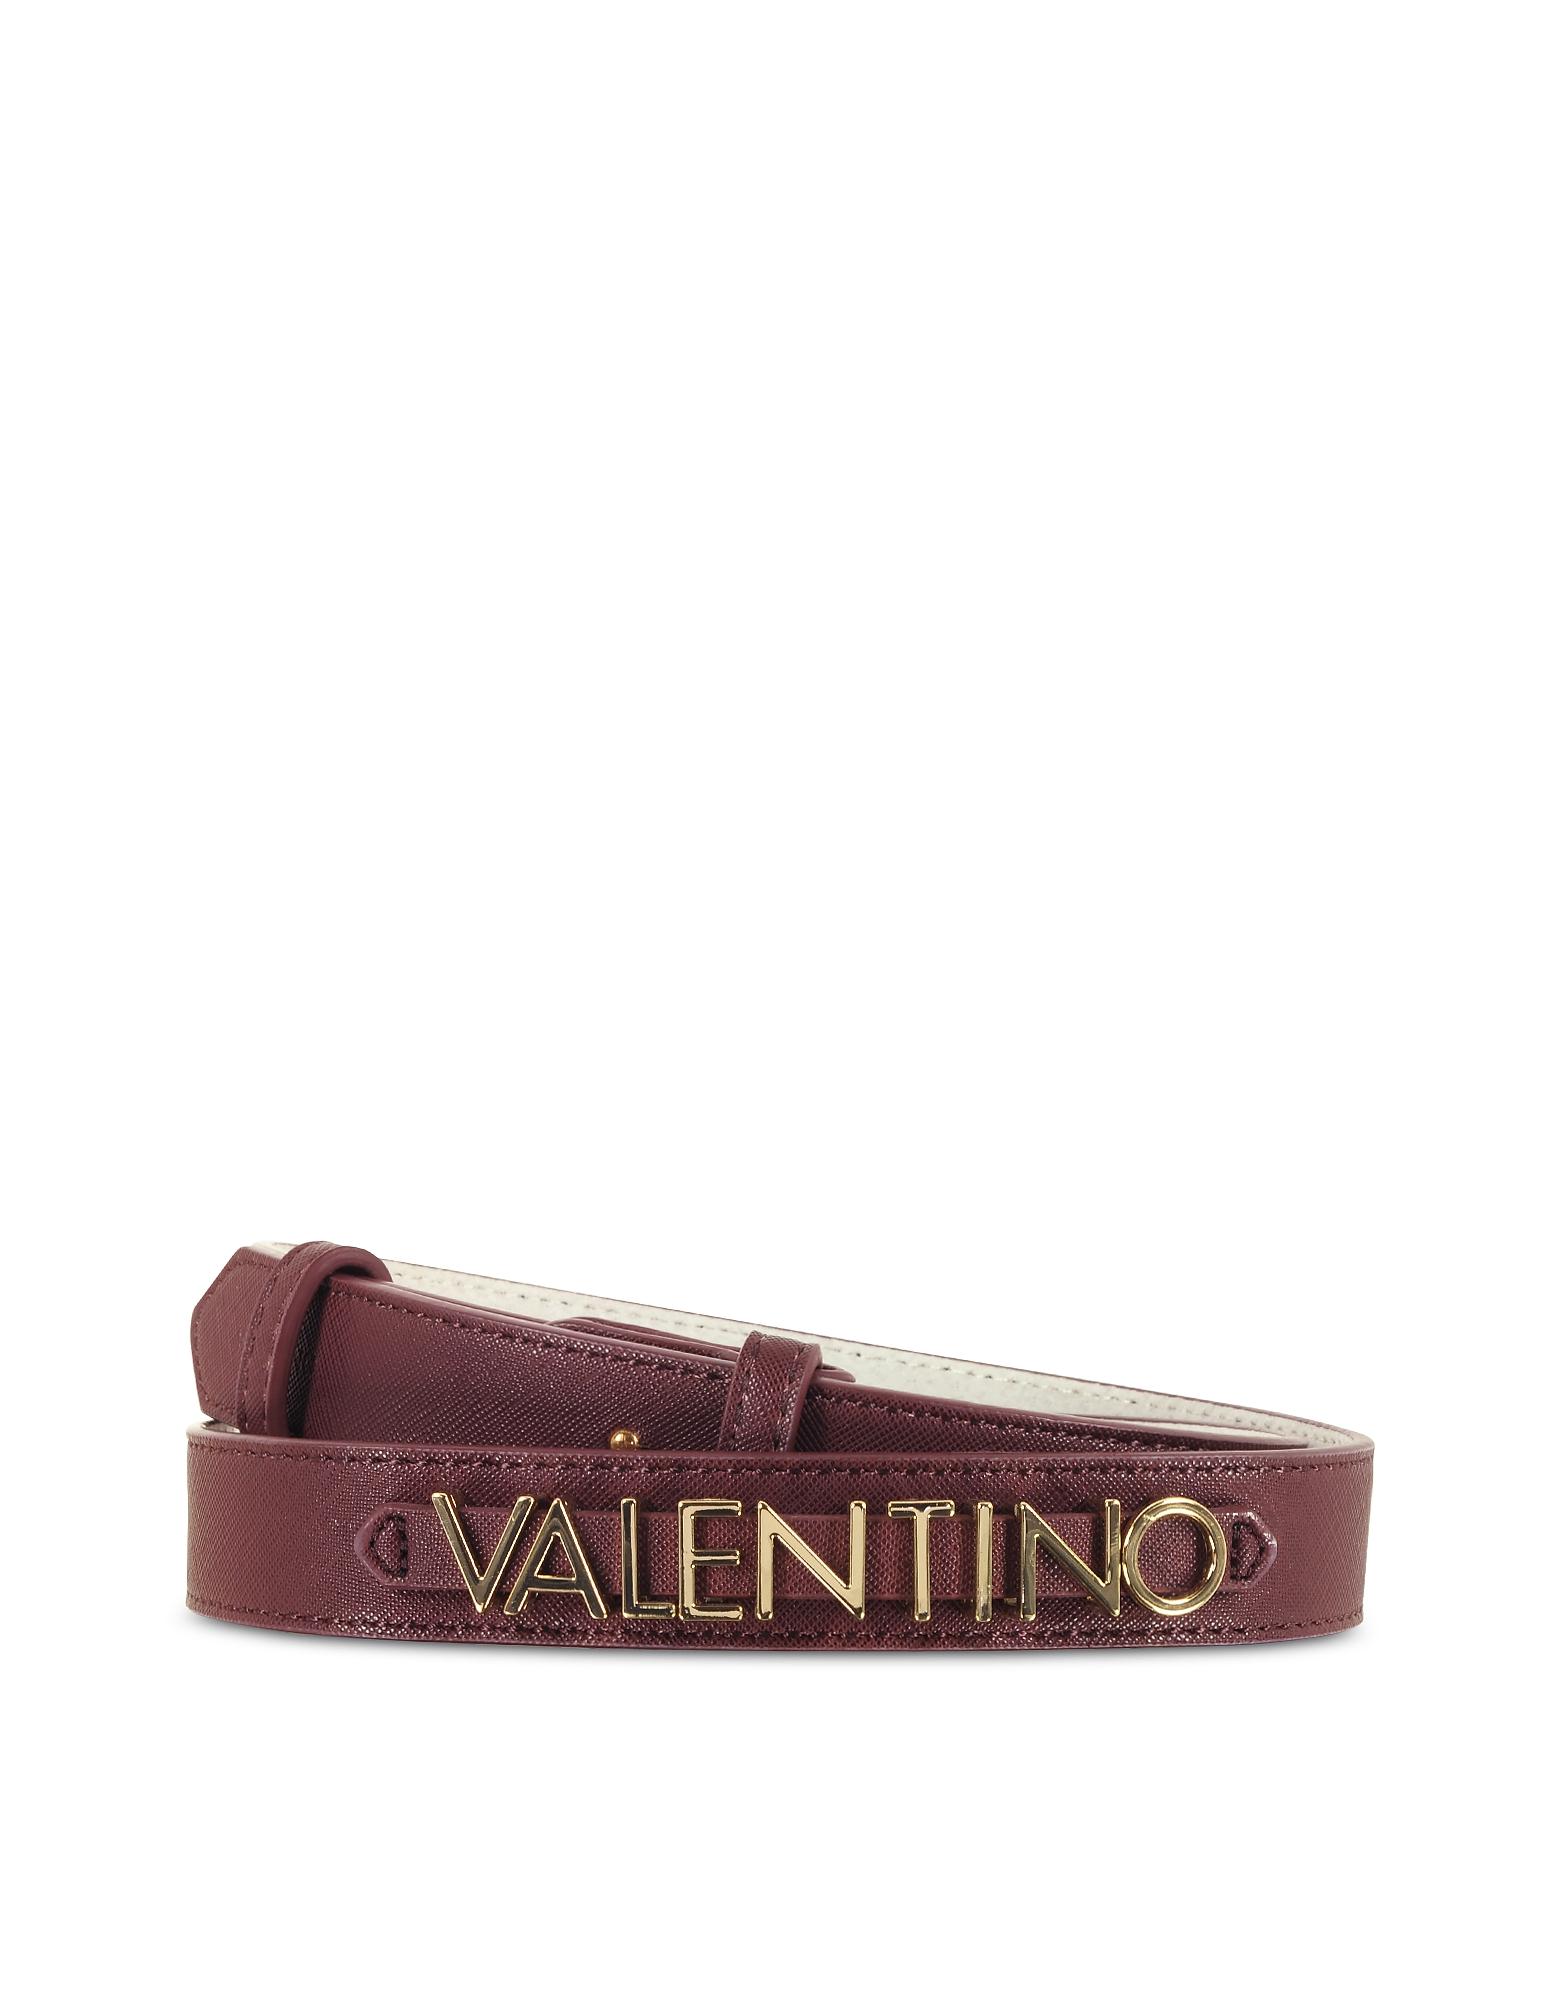 Valentino by Mario Valentino Designer Women's Belts, Sea Winter Purple Eco-Leather Women's Belt